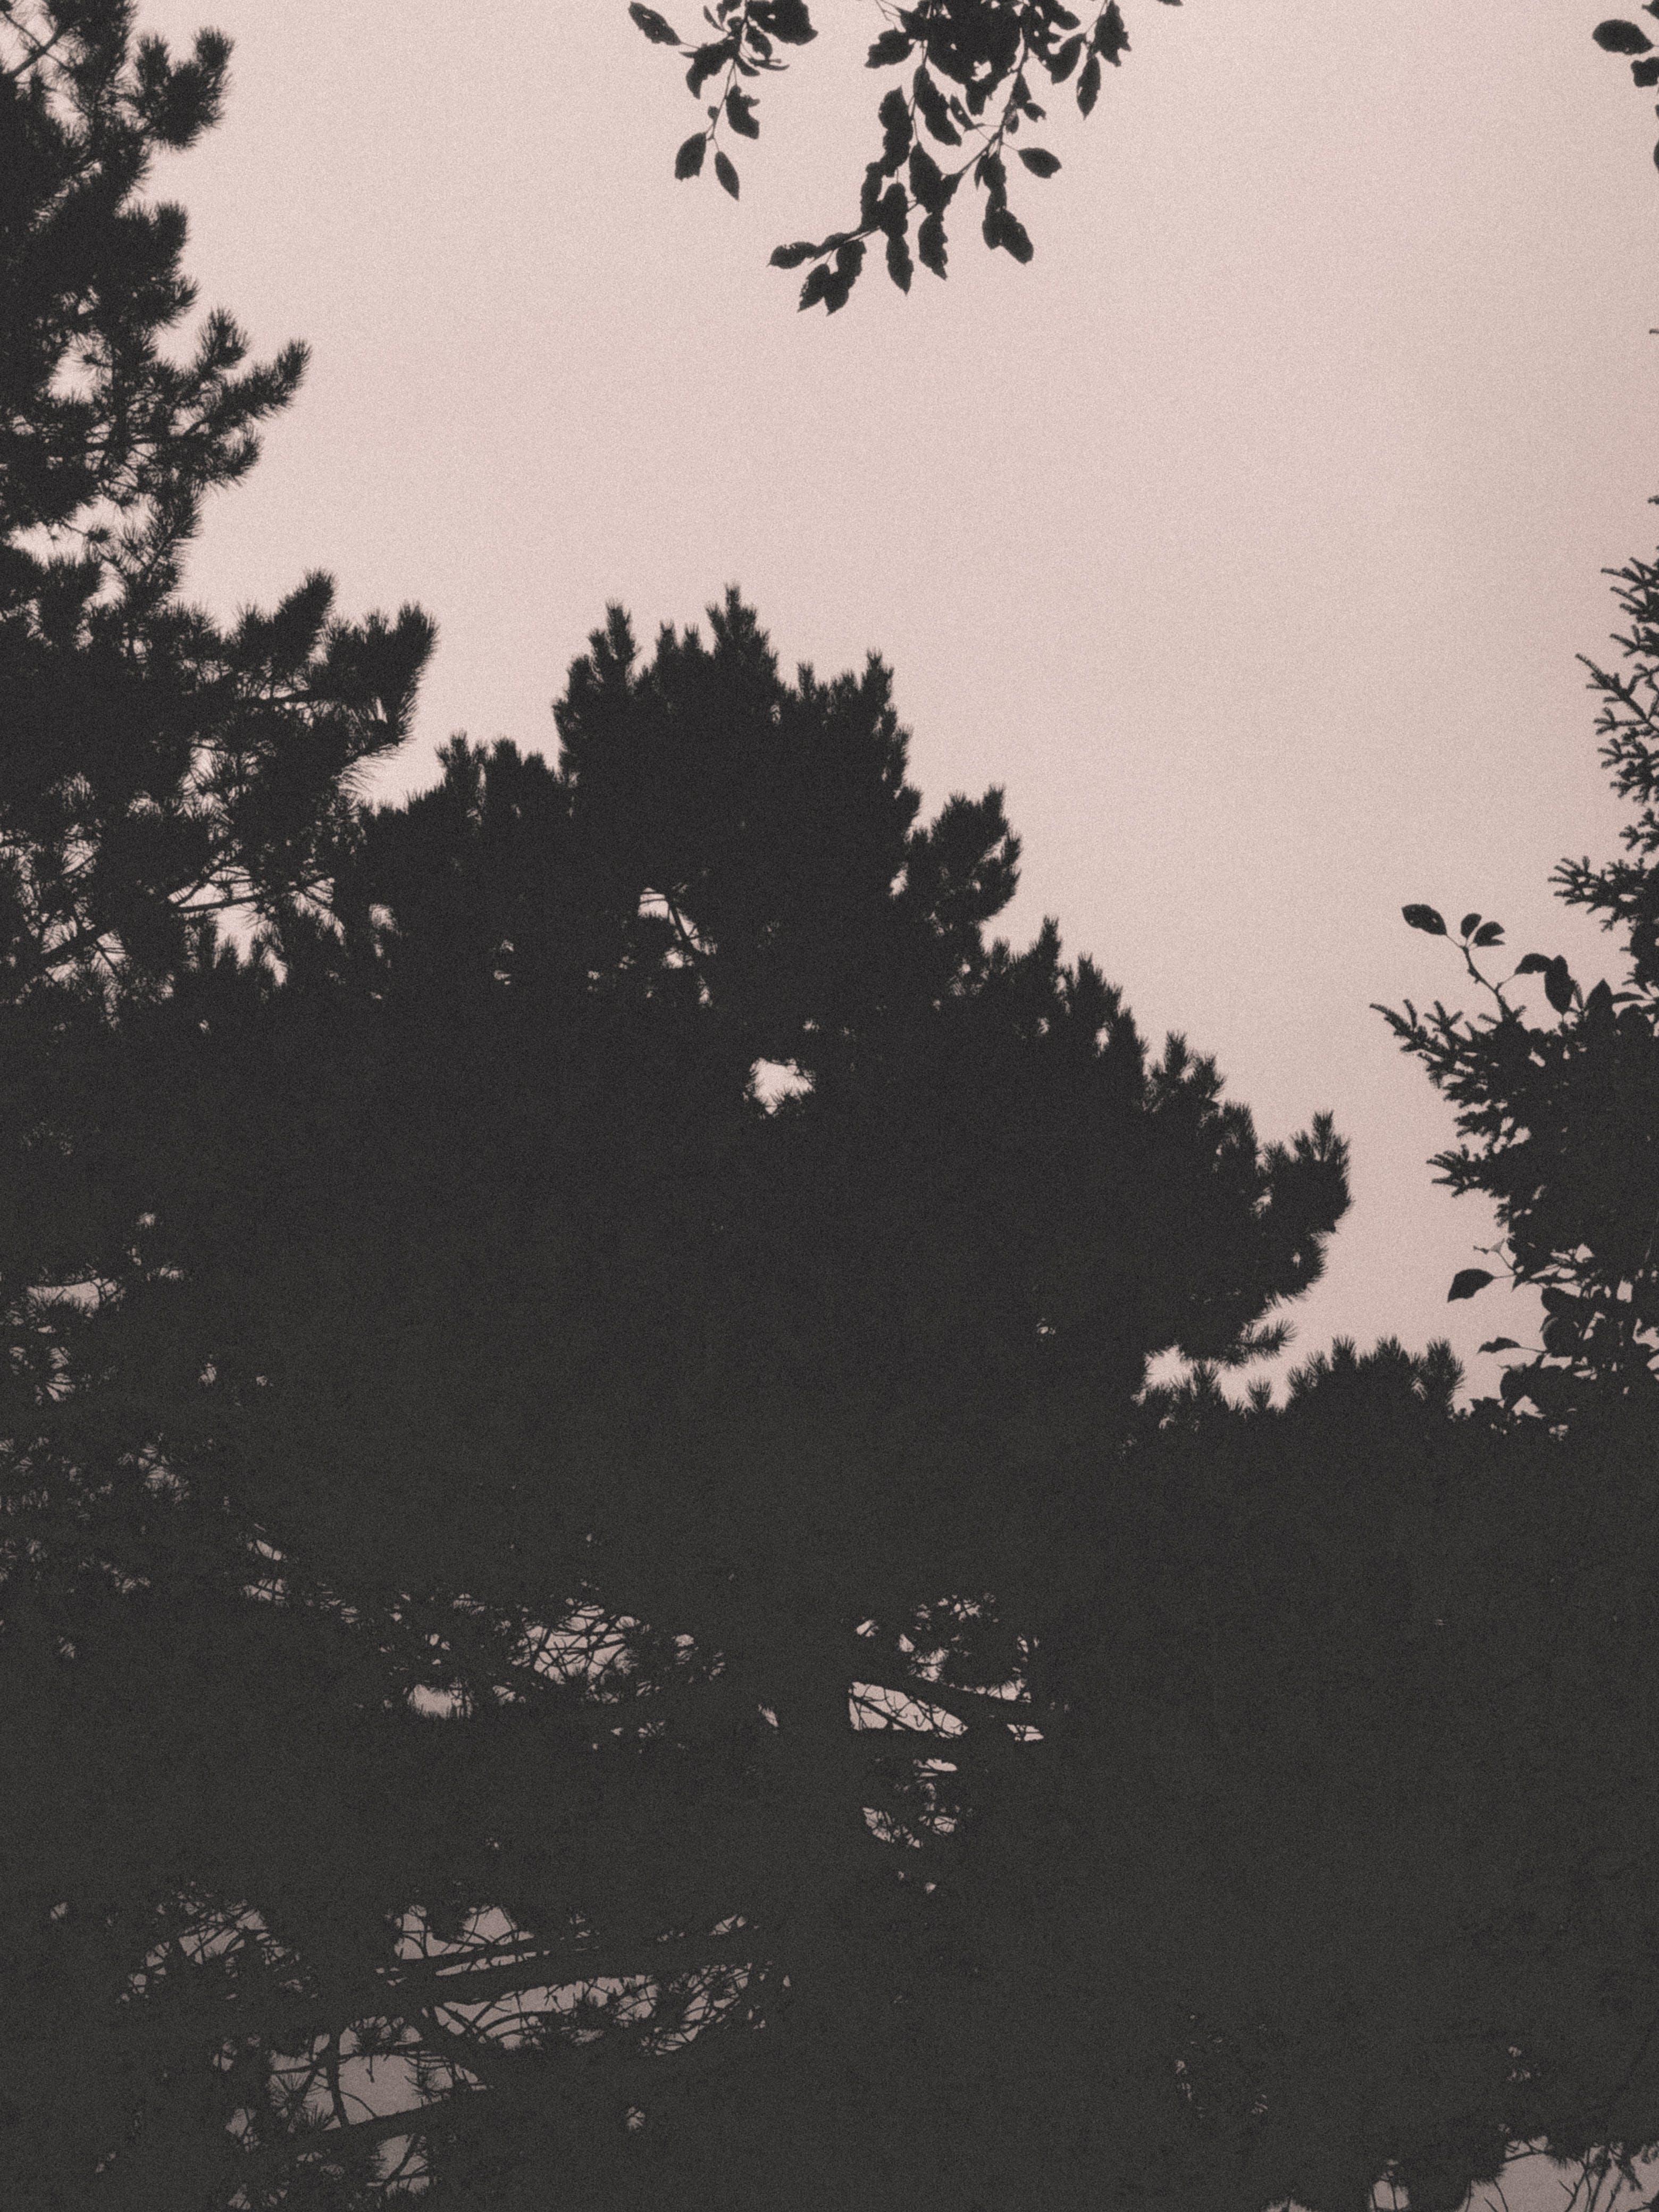 Free stock photo of sky, trees, silhouettes